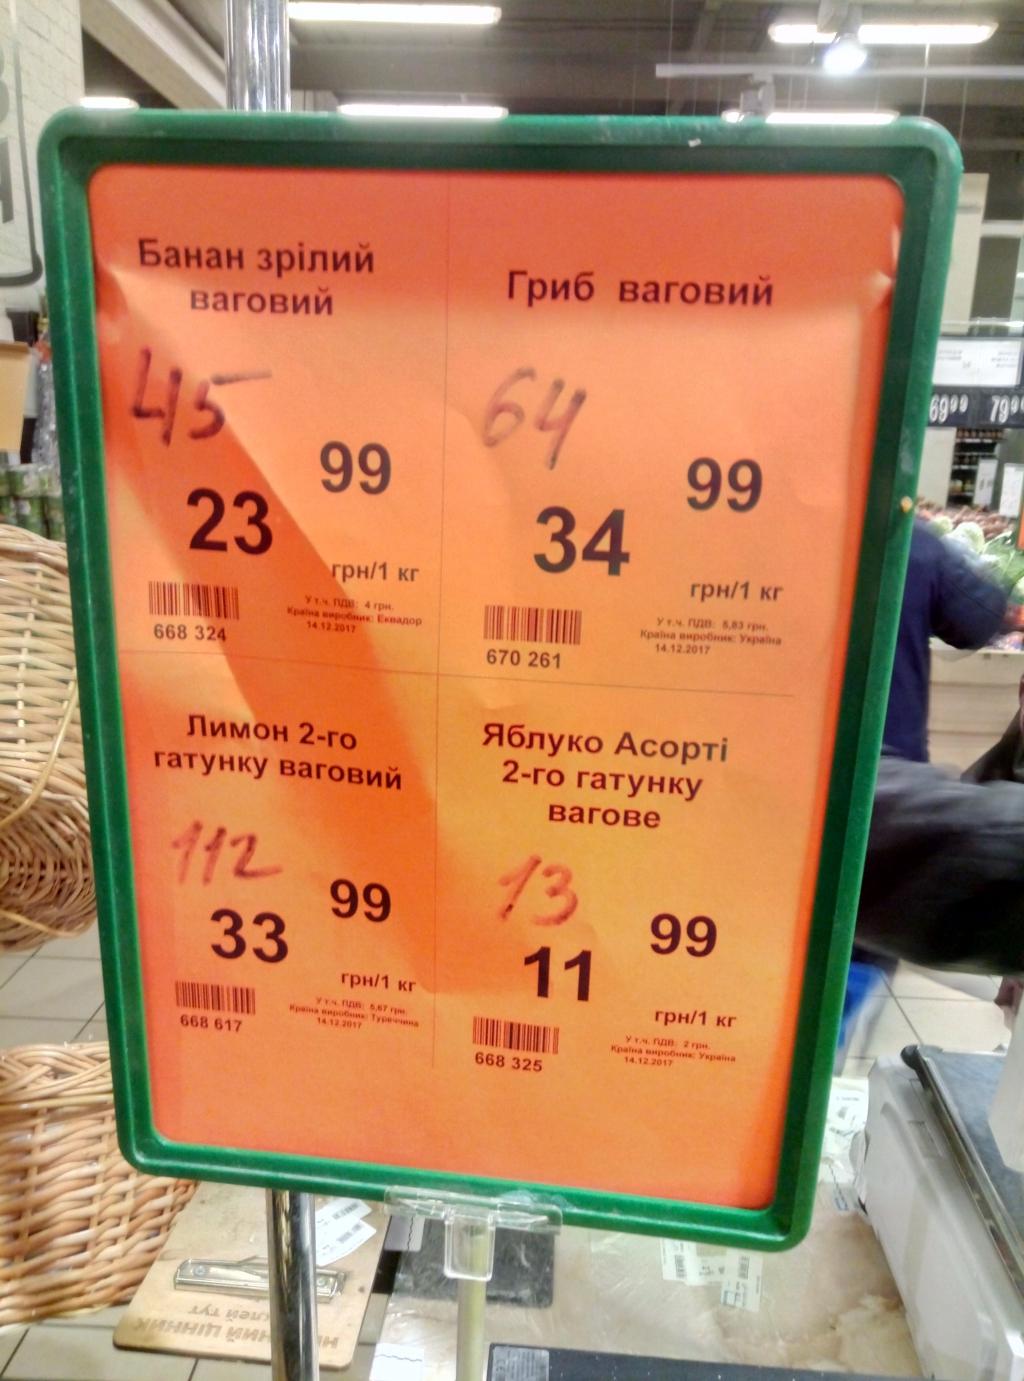 Ревизор - Магазин Эко Маркет .Киев Кибальчича 13